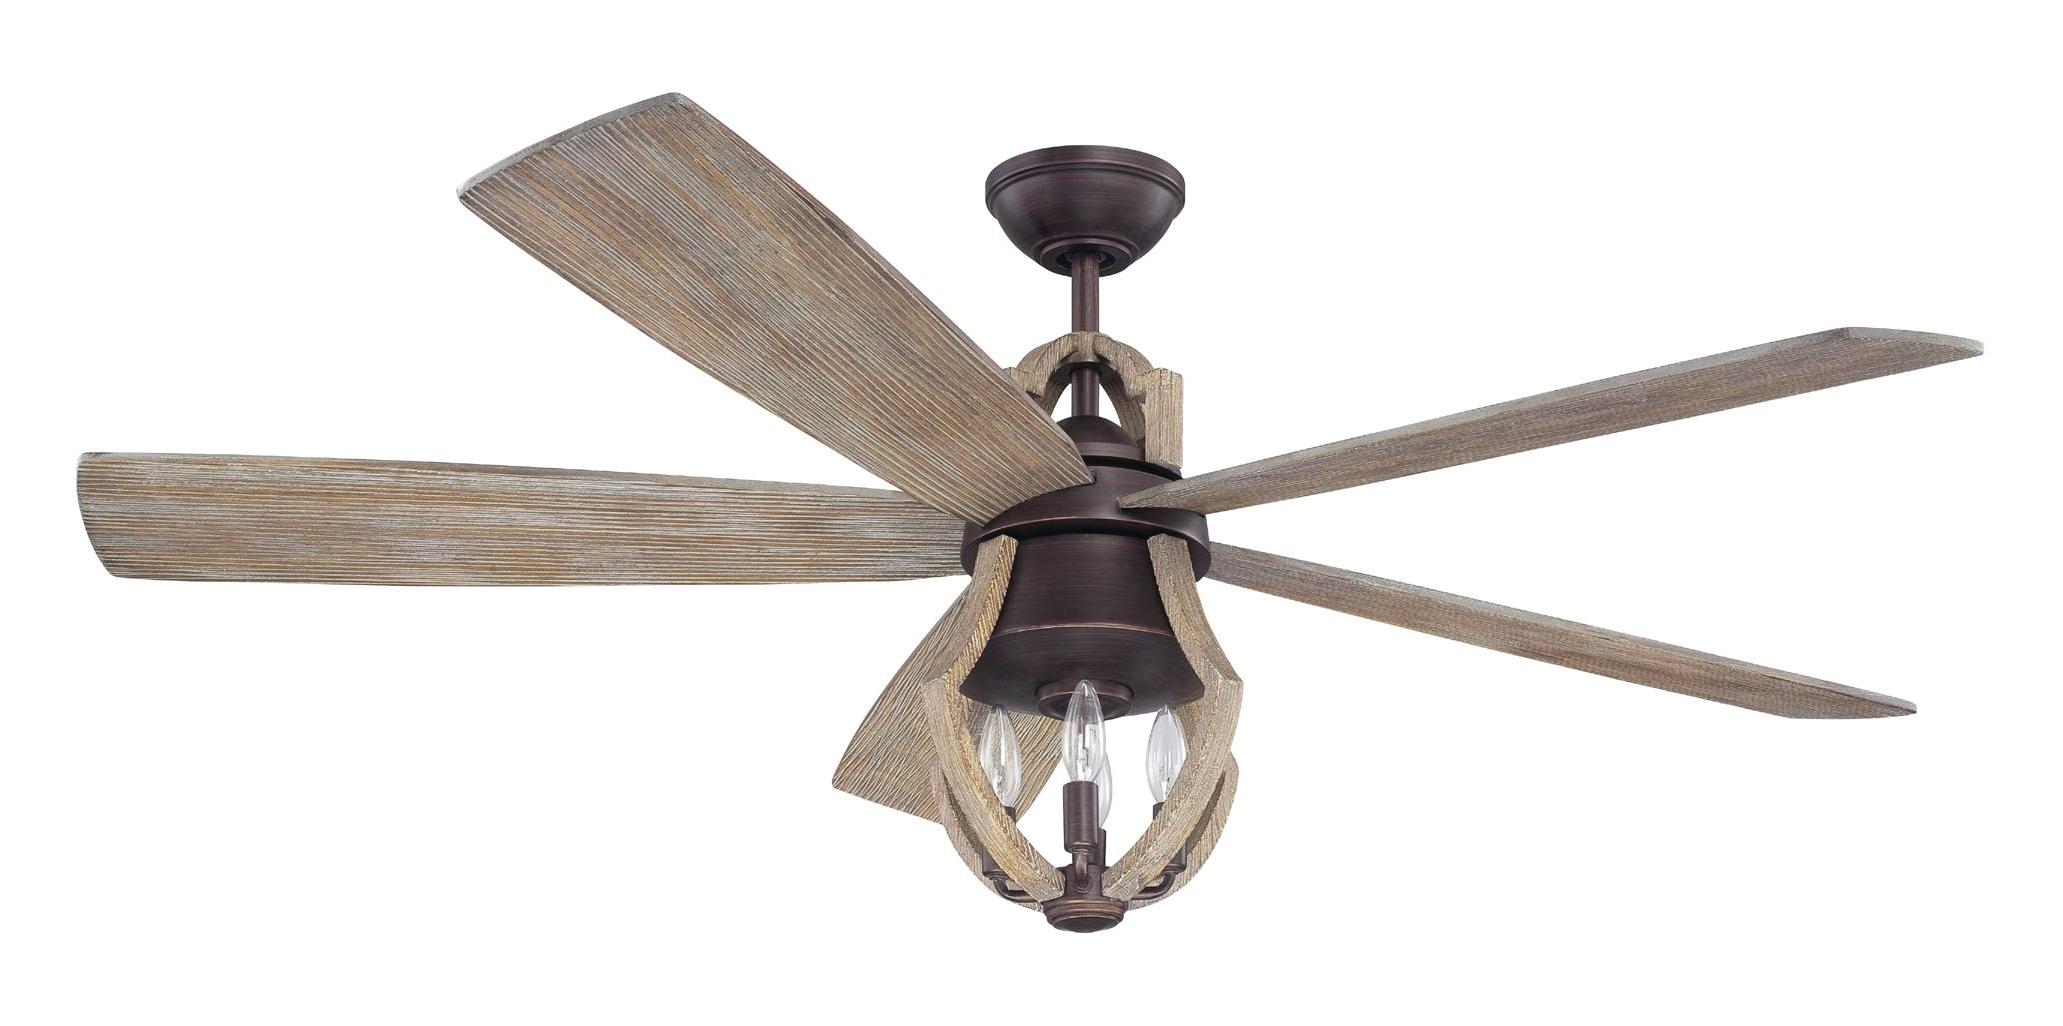 Reclaimed Wood Ceiling Fan (View 16 of 20)